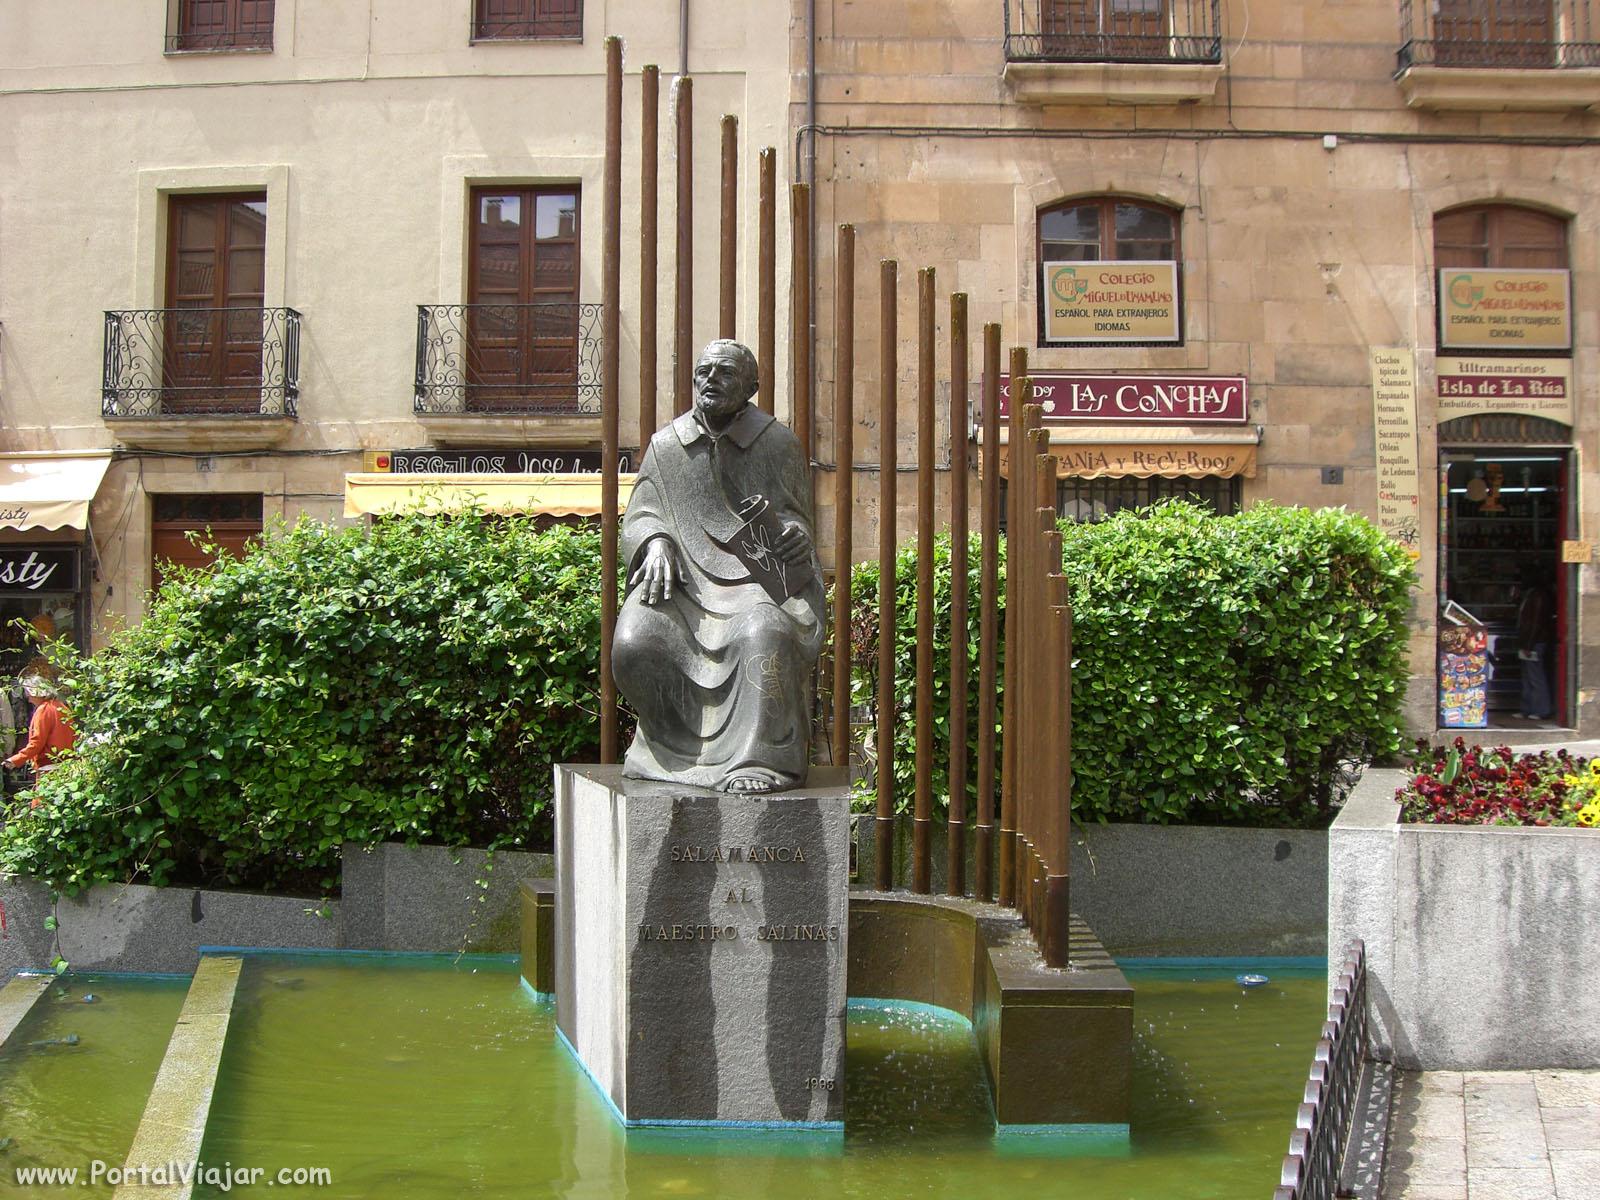 Monumento al Maestro Salinas (Salamanca)